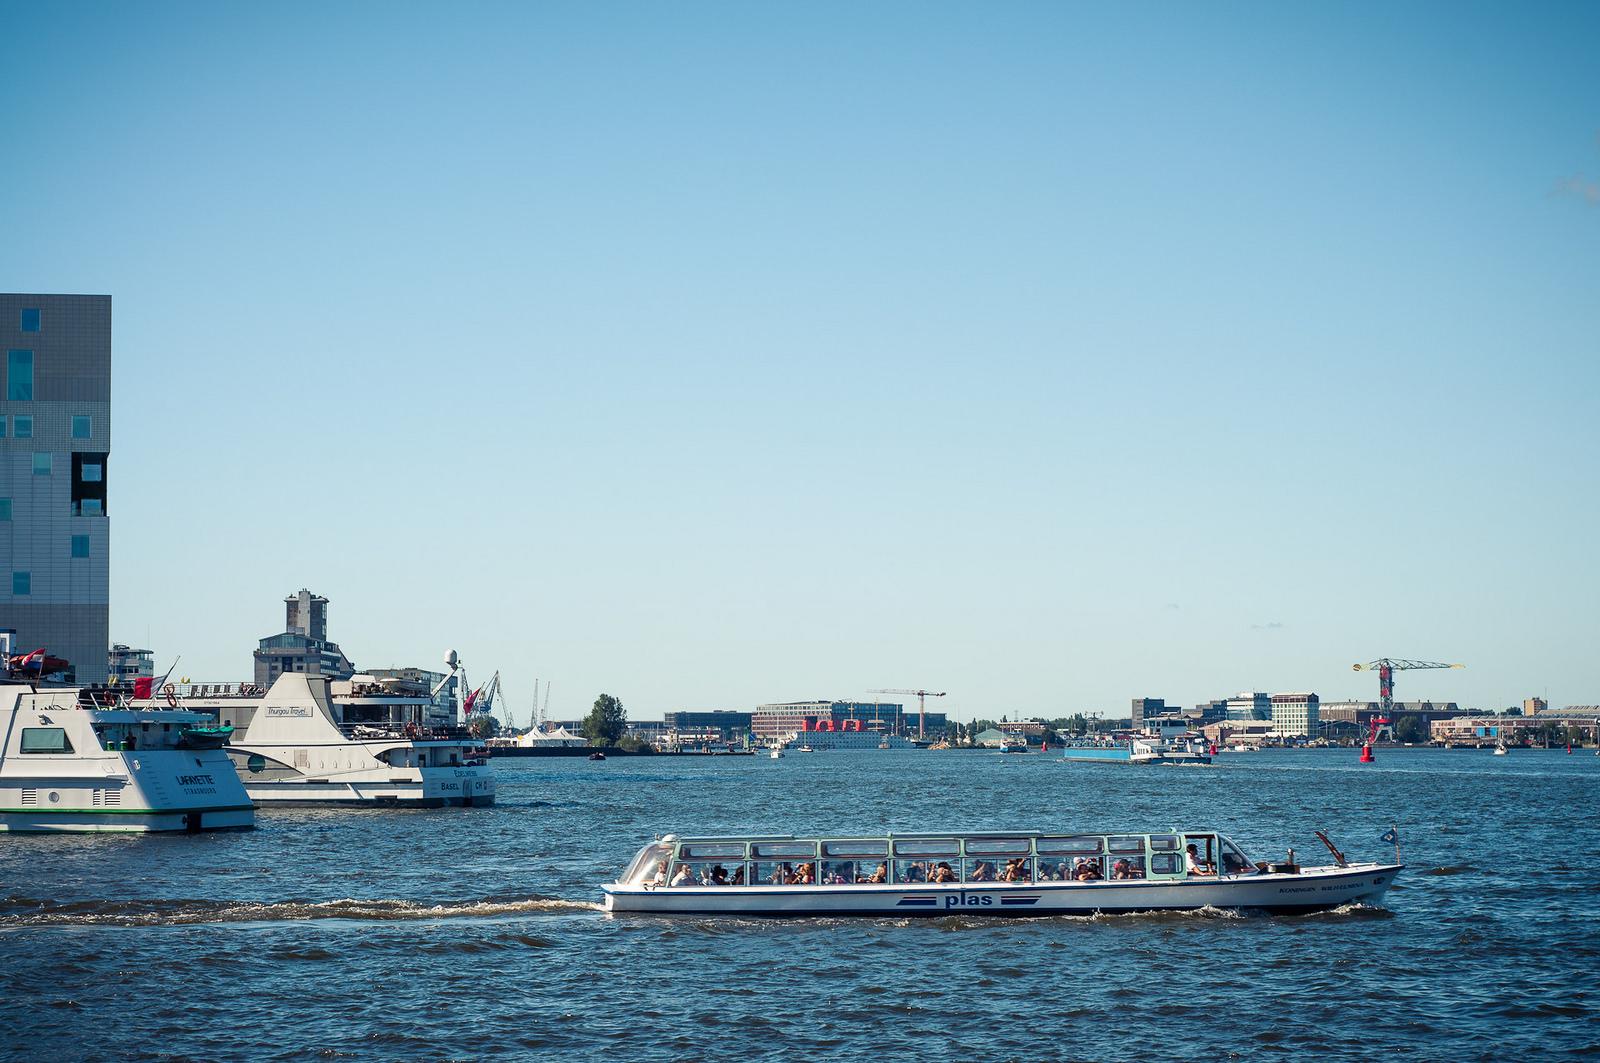 Amsterdam-Noord| © Mr. Amsterdam/Flickr